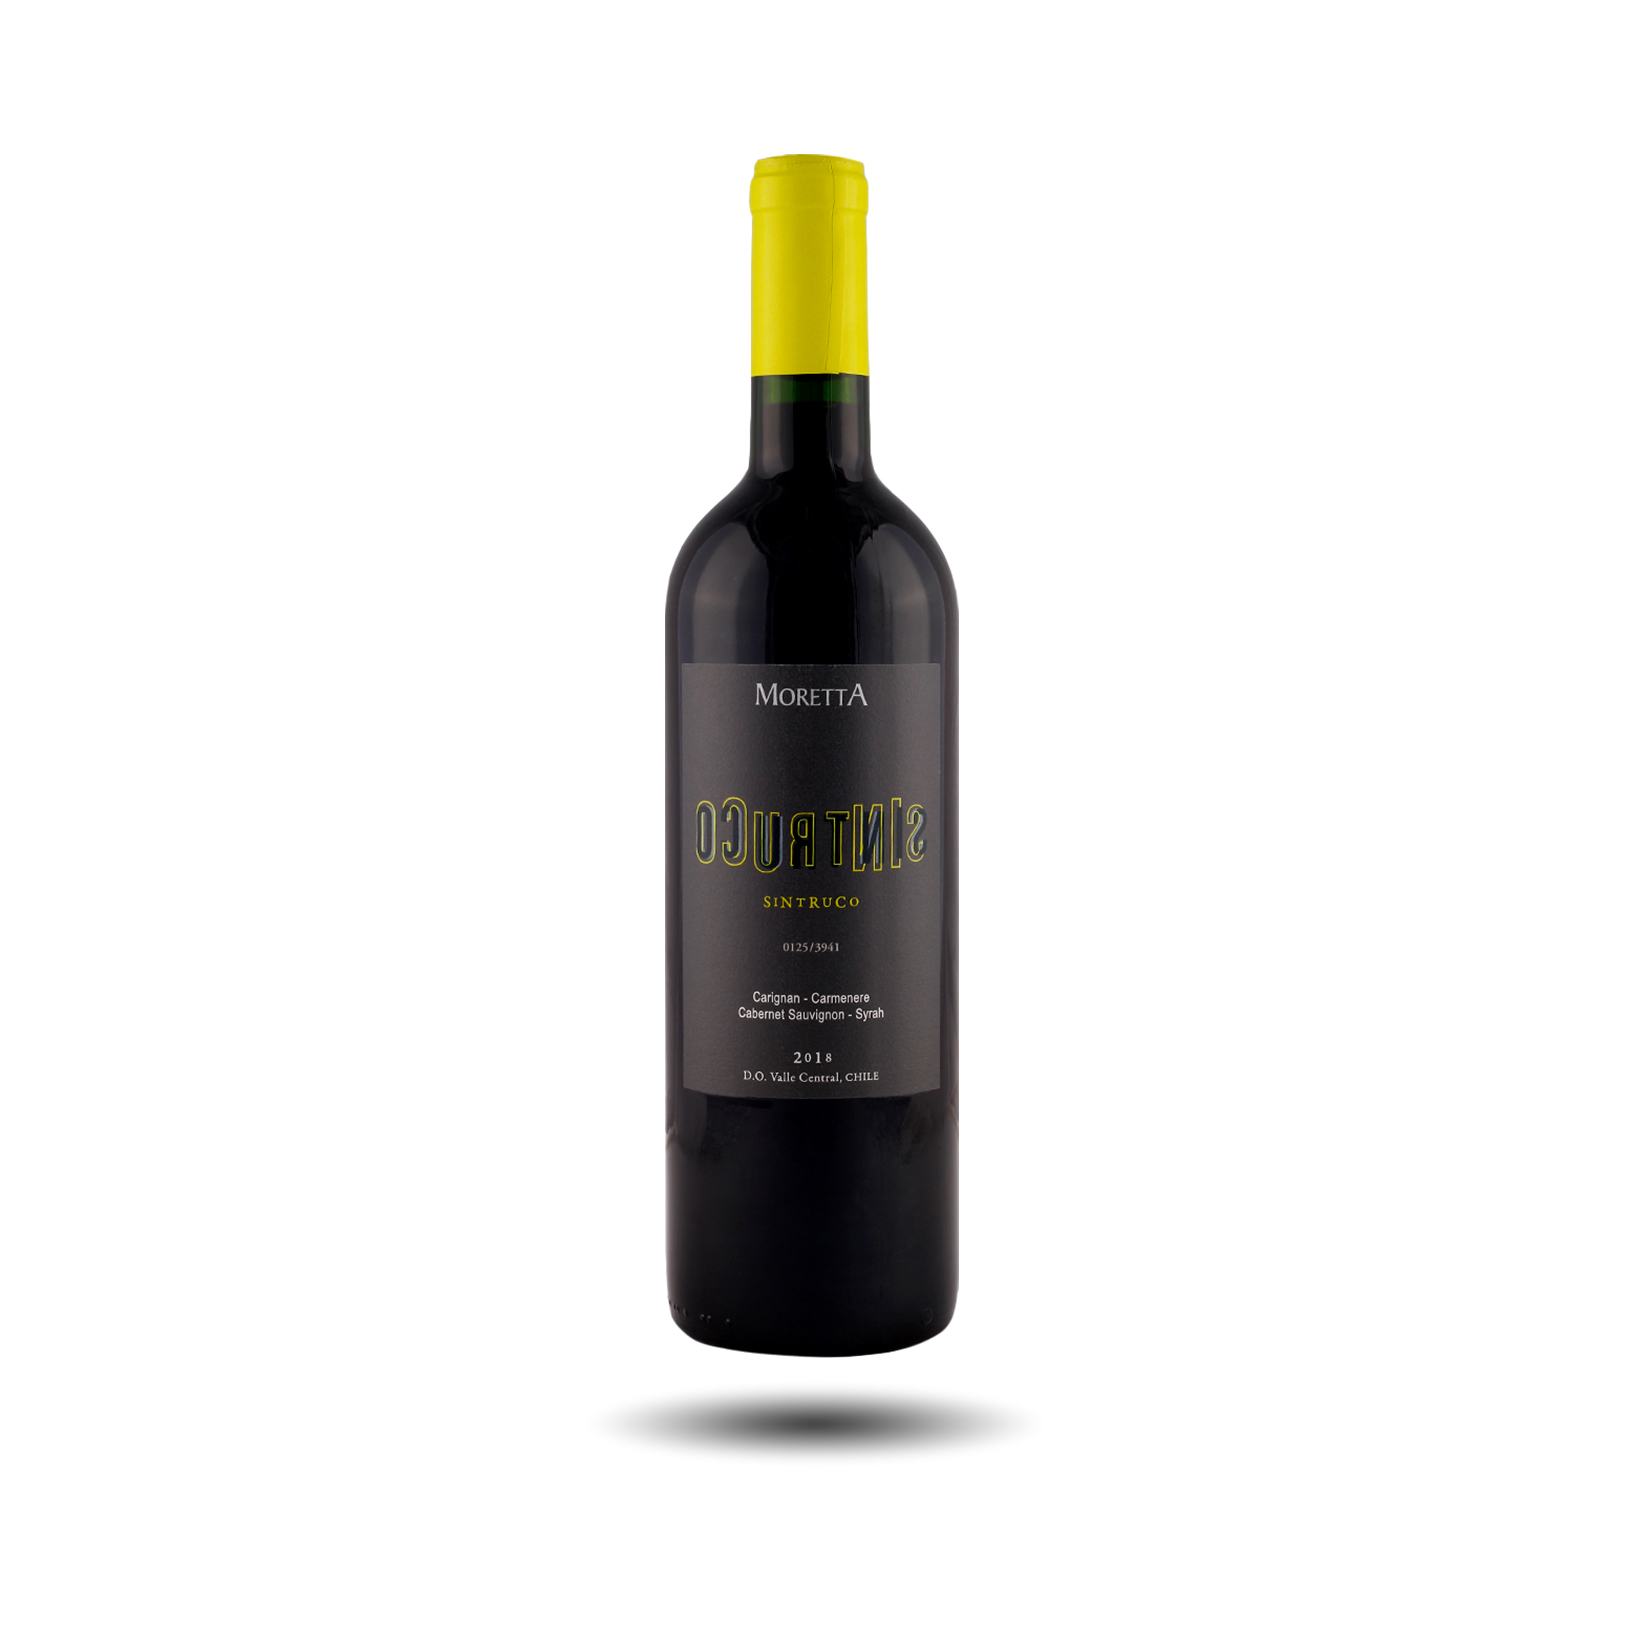 Moretta Wines - Sintruco, 2019